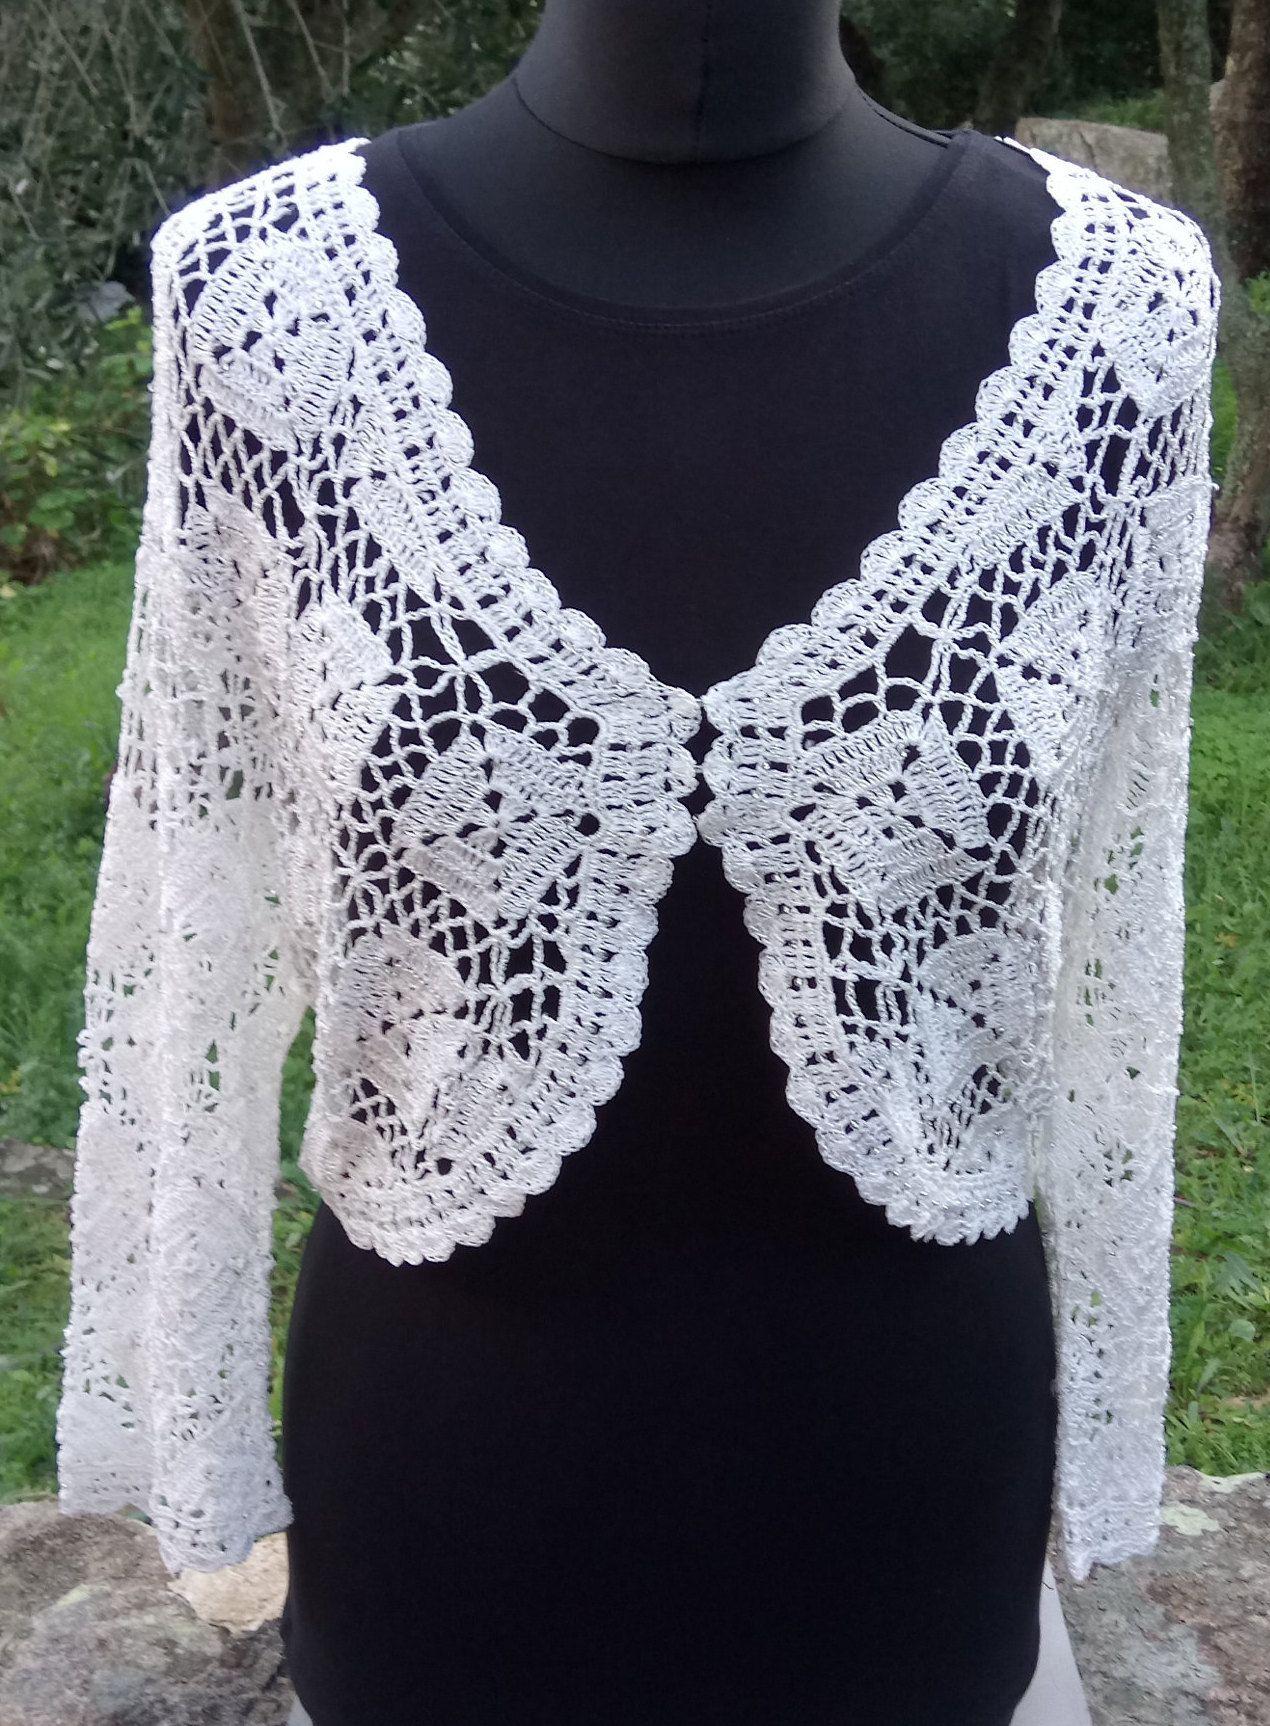 Vintage Cream Wedding Shrug, Crochet Knit Bridal Cover Up, Cream Bridesmaid Bolero, Sparkly Wedding Shrug